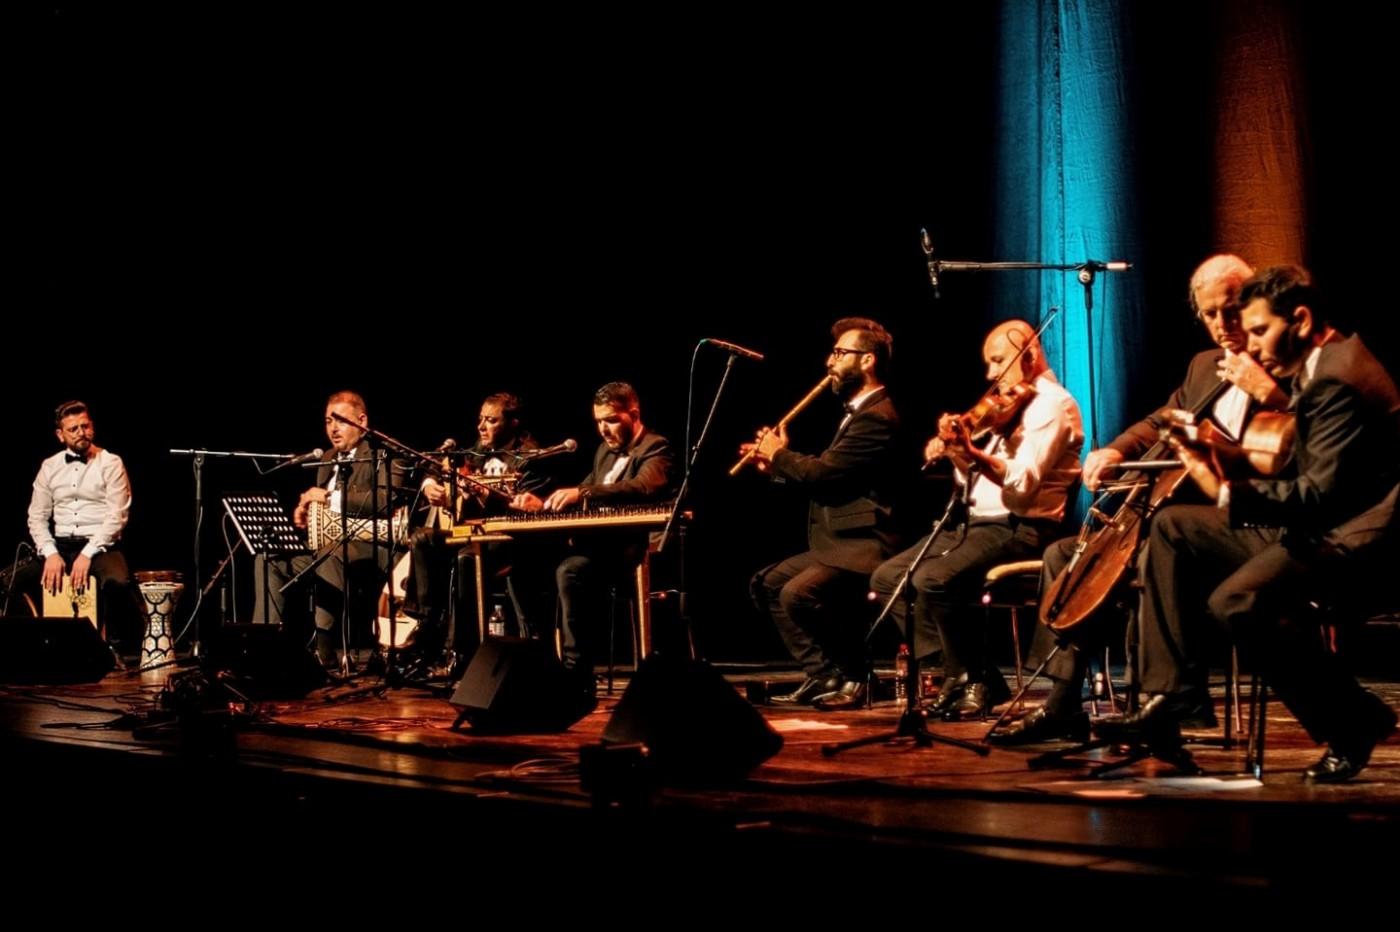 Maged Kildan and Jazz Friends Ensemble - Konzertstream aus dem Bellevue di Monaco